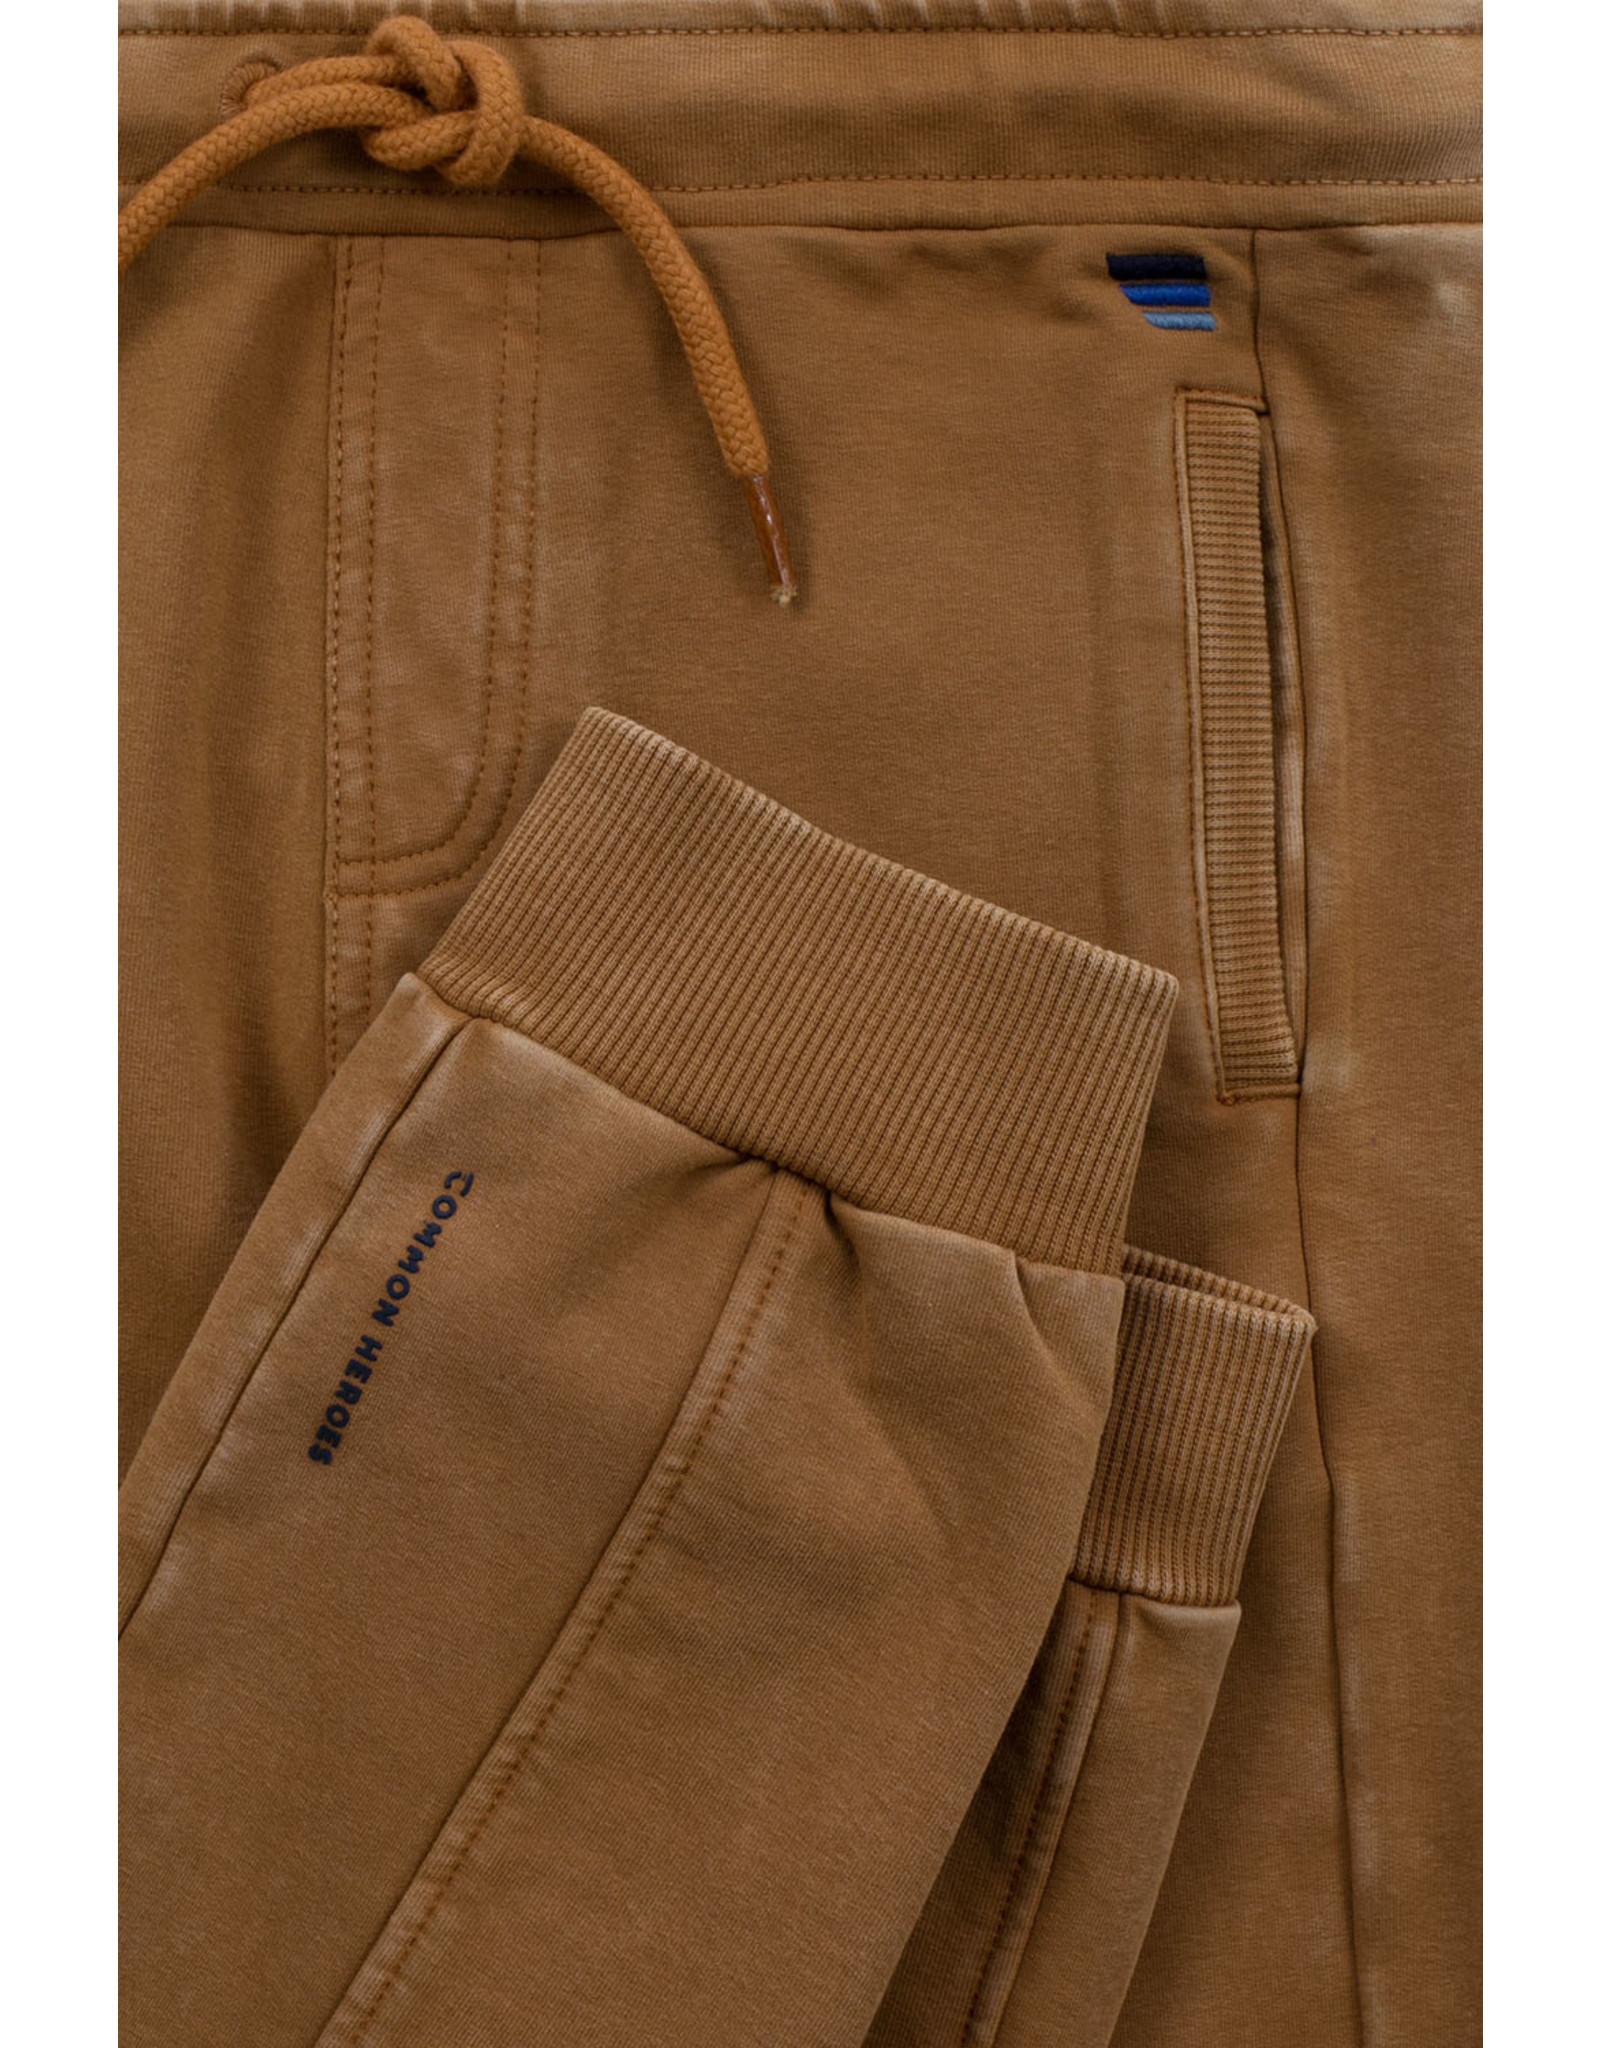 Common Heroes BRAM Acid wash Sweat pants sand